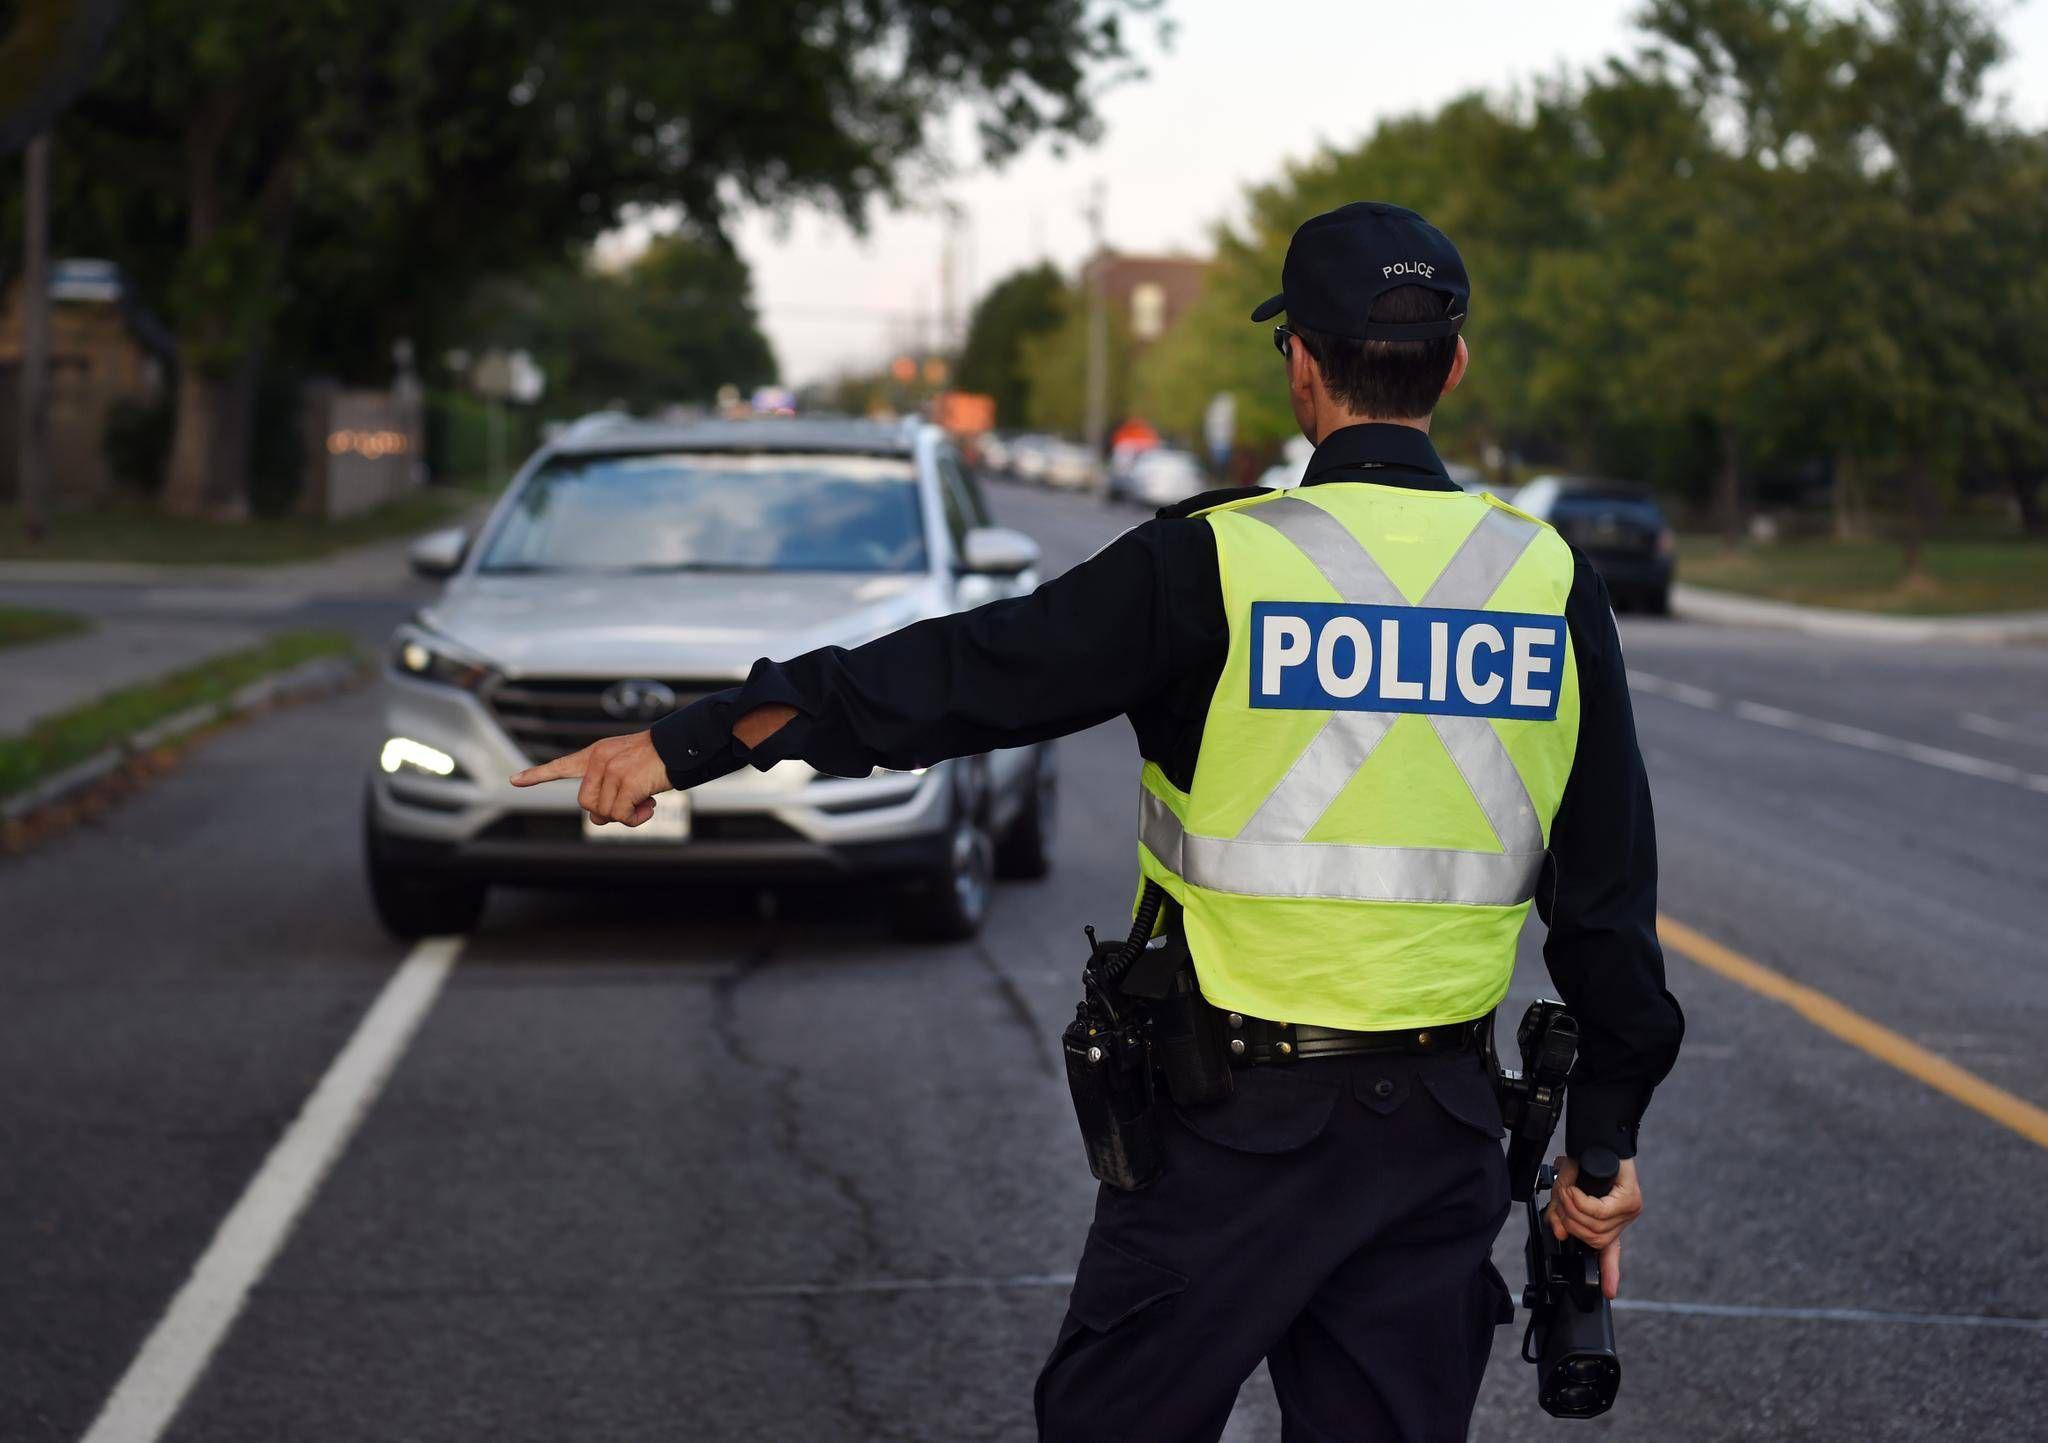 Are licence plates fair game for random police checks? - The